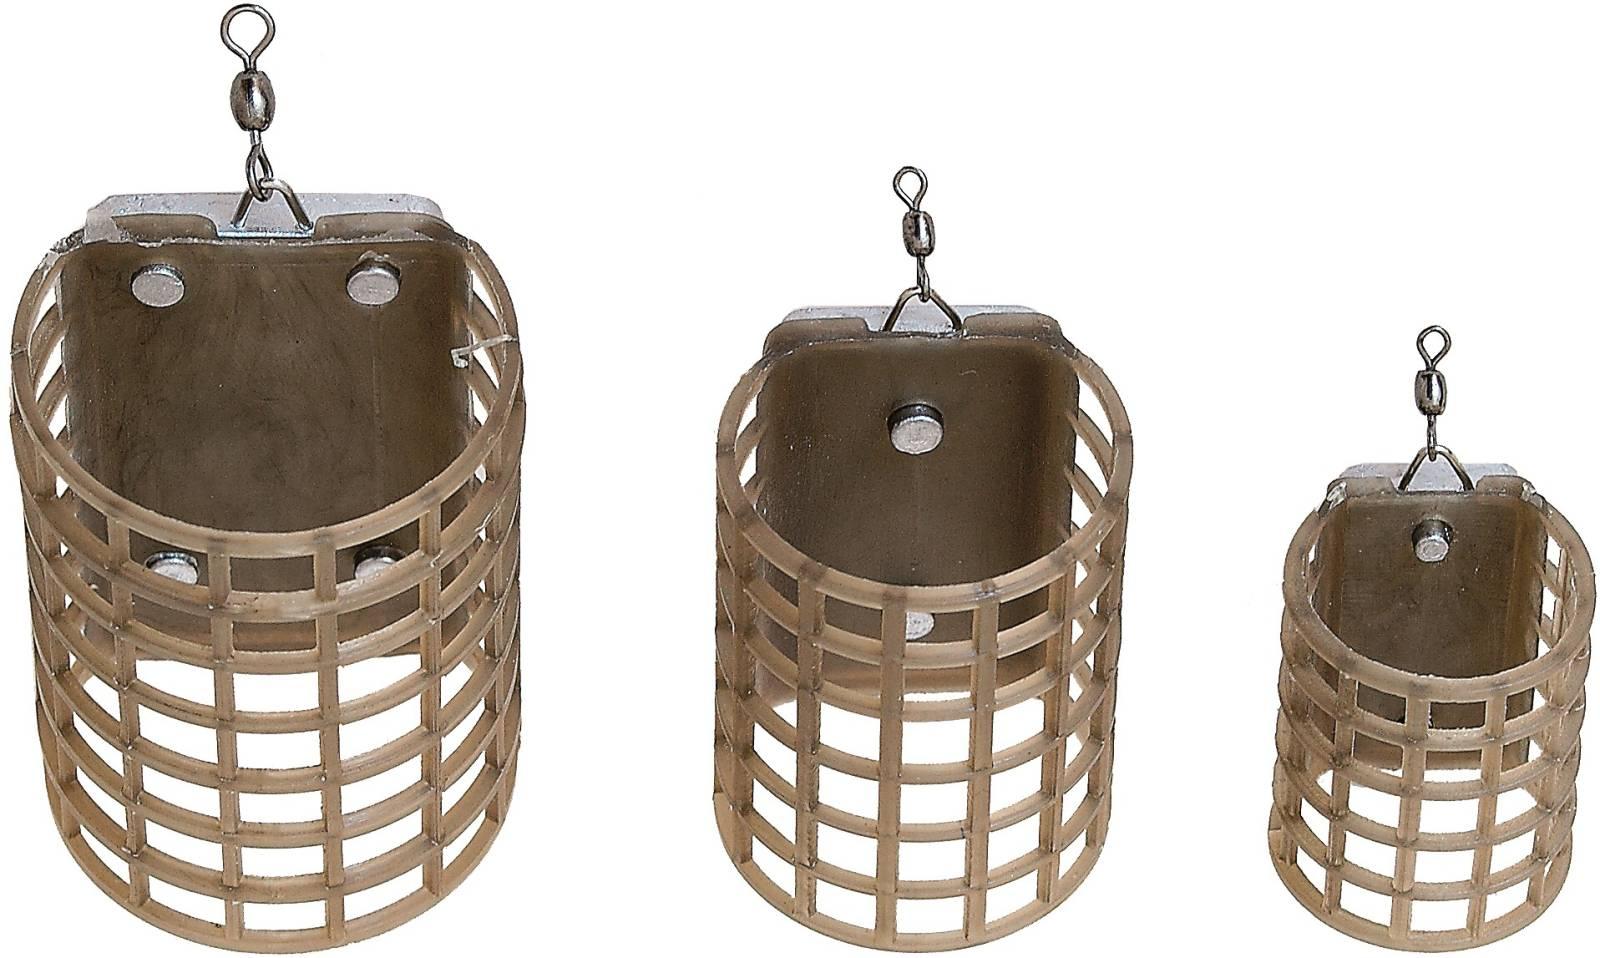 Feederové krmítko FM - S 30x25mm 10g, 20g, 30g a 40g - zvìtšit obrázek